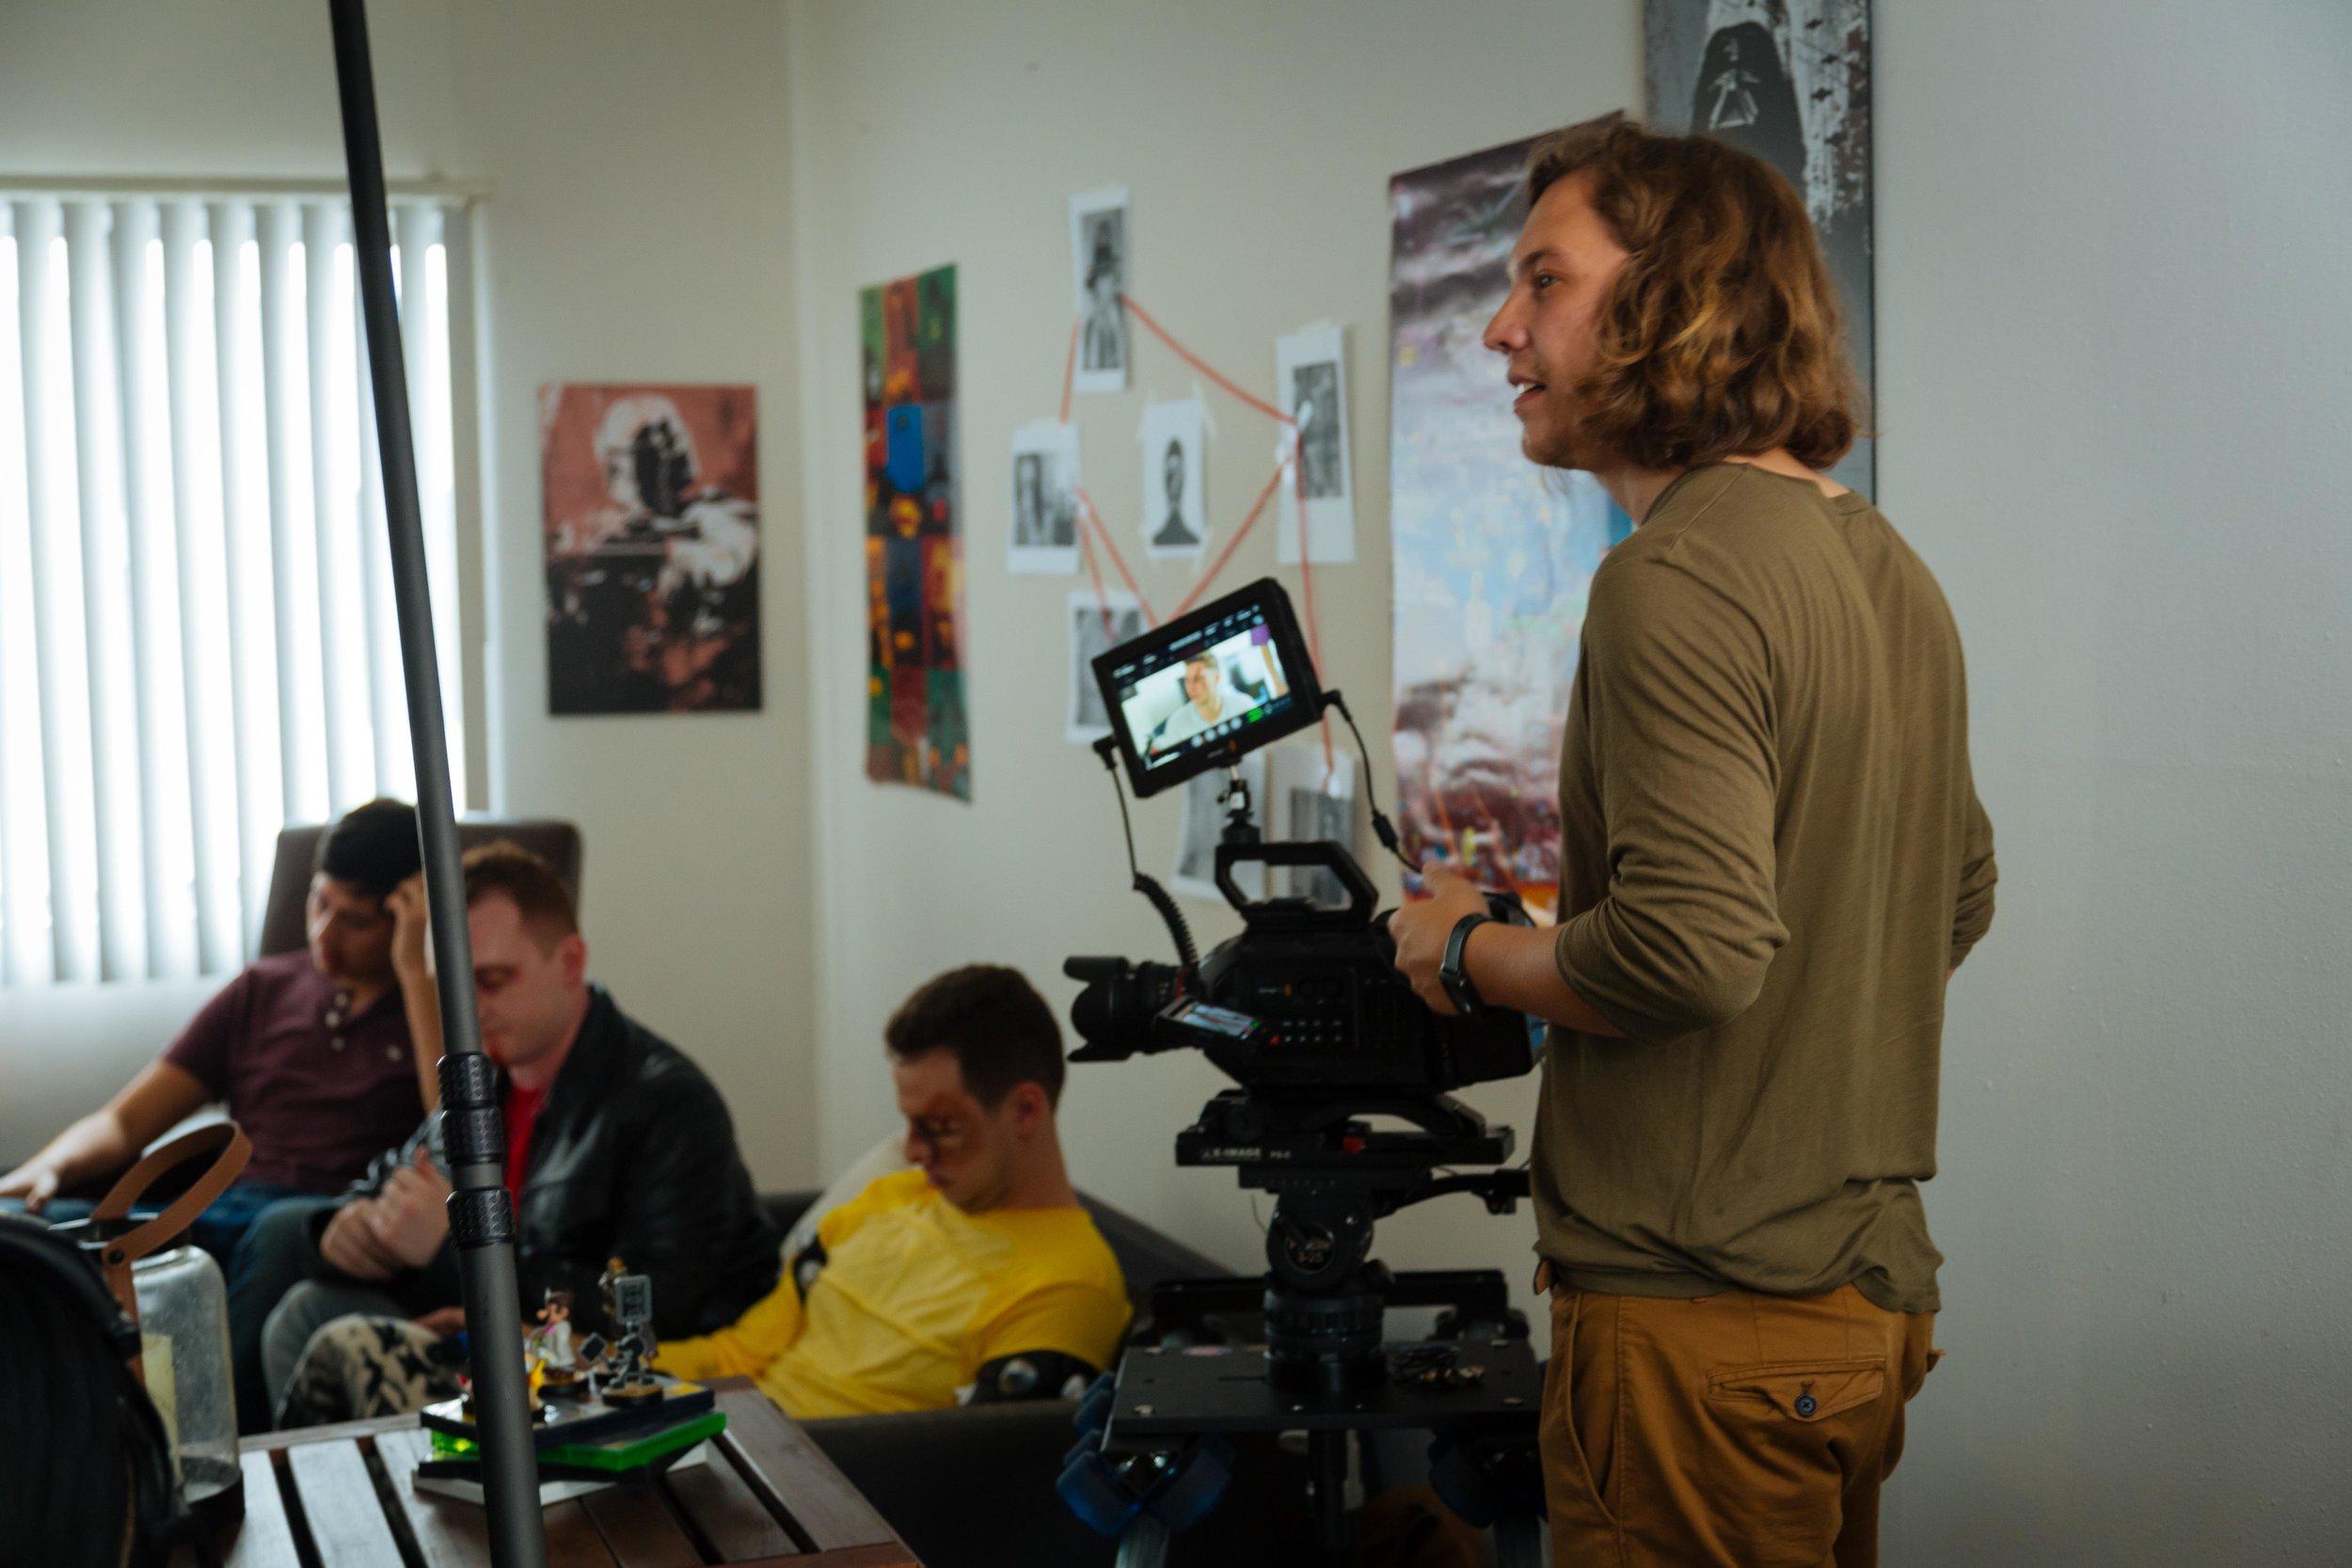 Konstantin Frolov cinematographer, director of photography